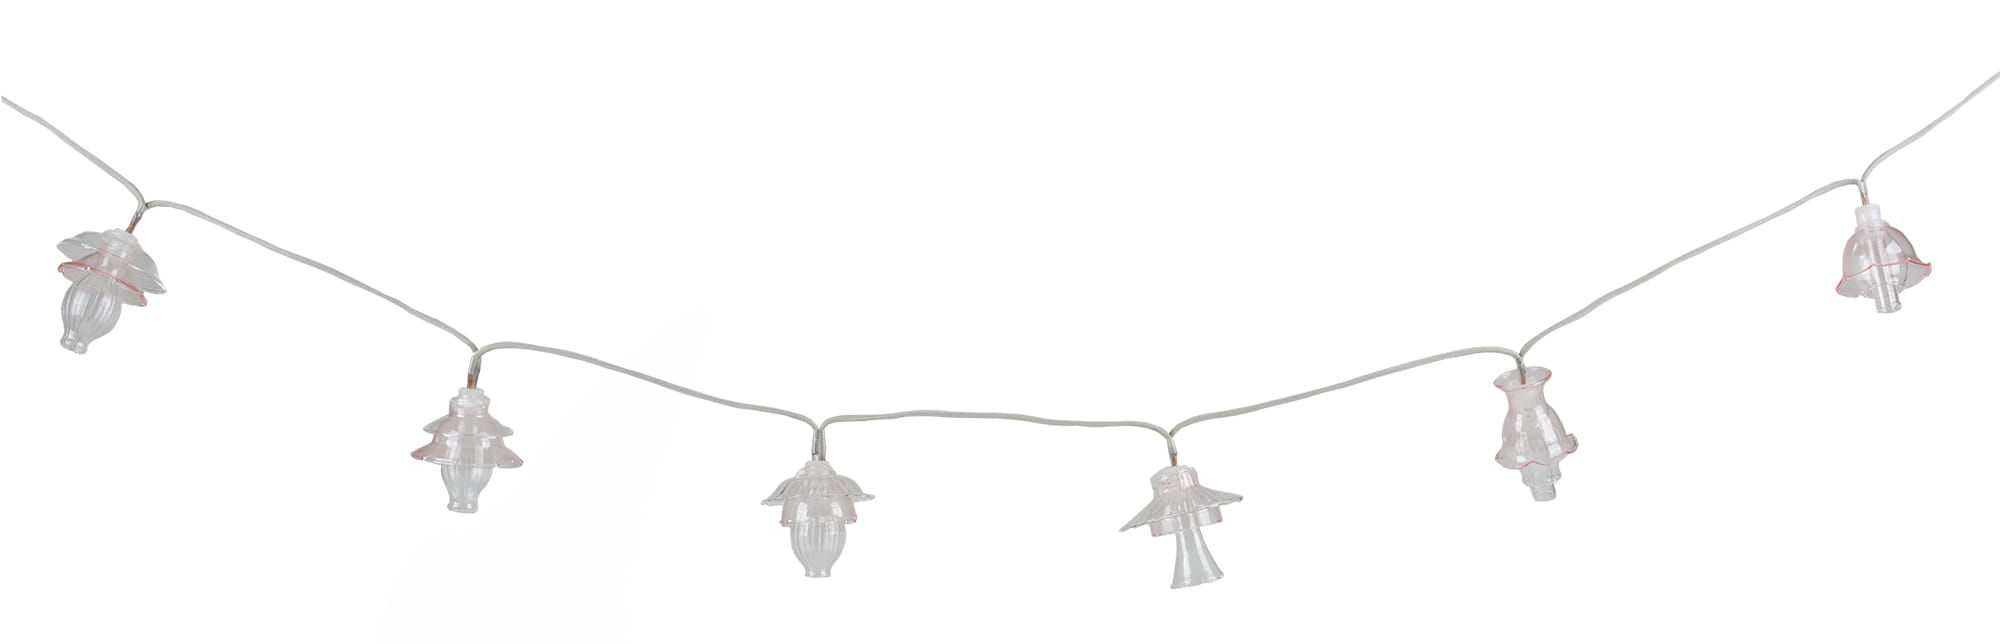 Lighting - Light-up Accessories - Floralia Luminous garland - LED by Seletti - Pink - Blown glass